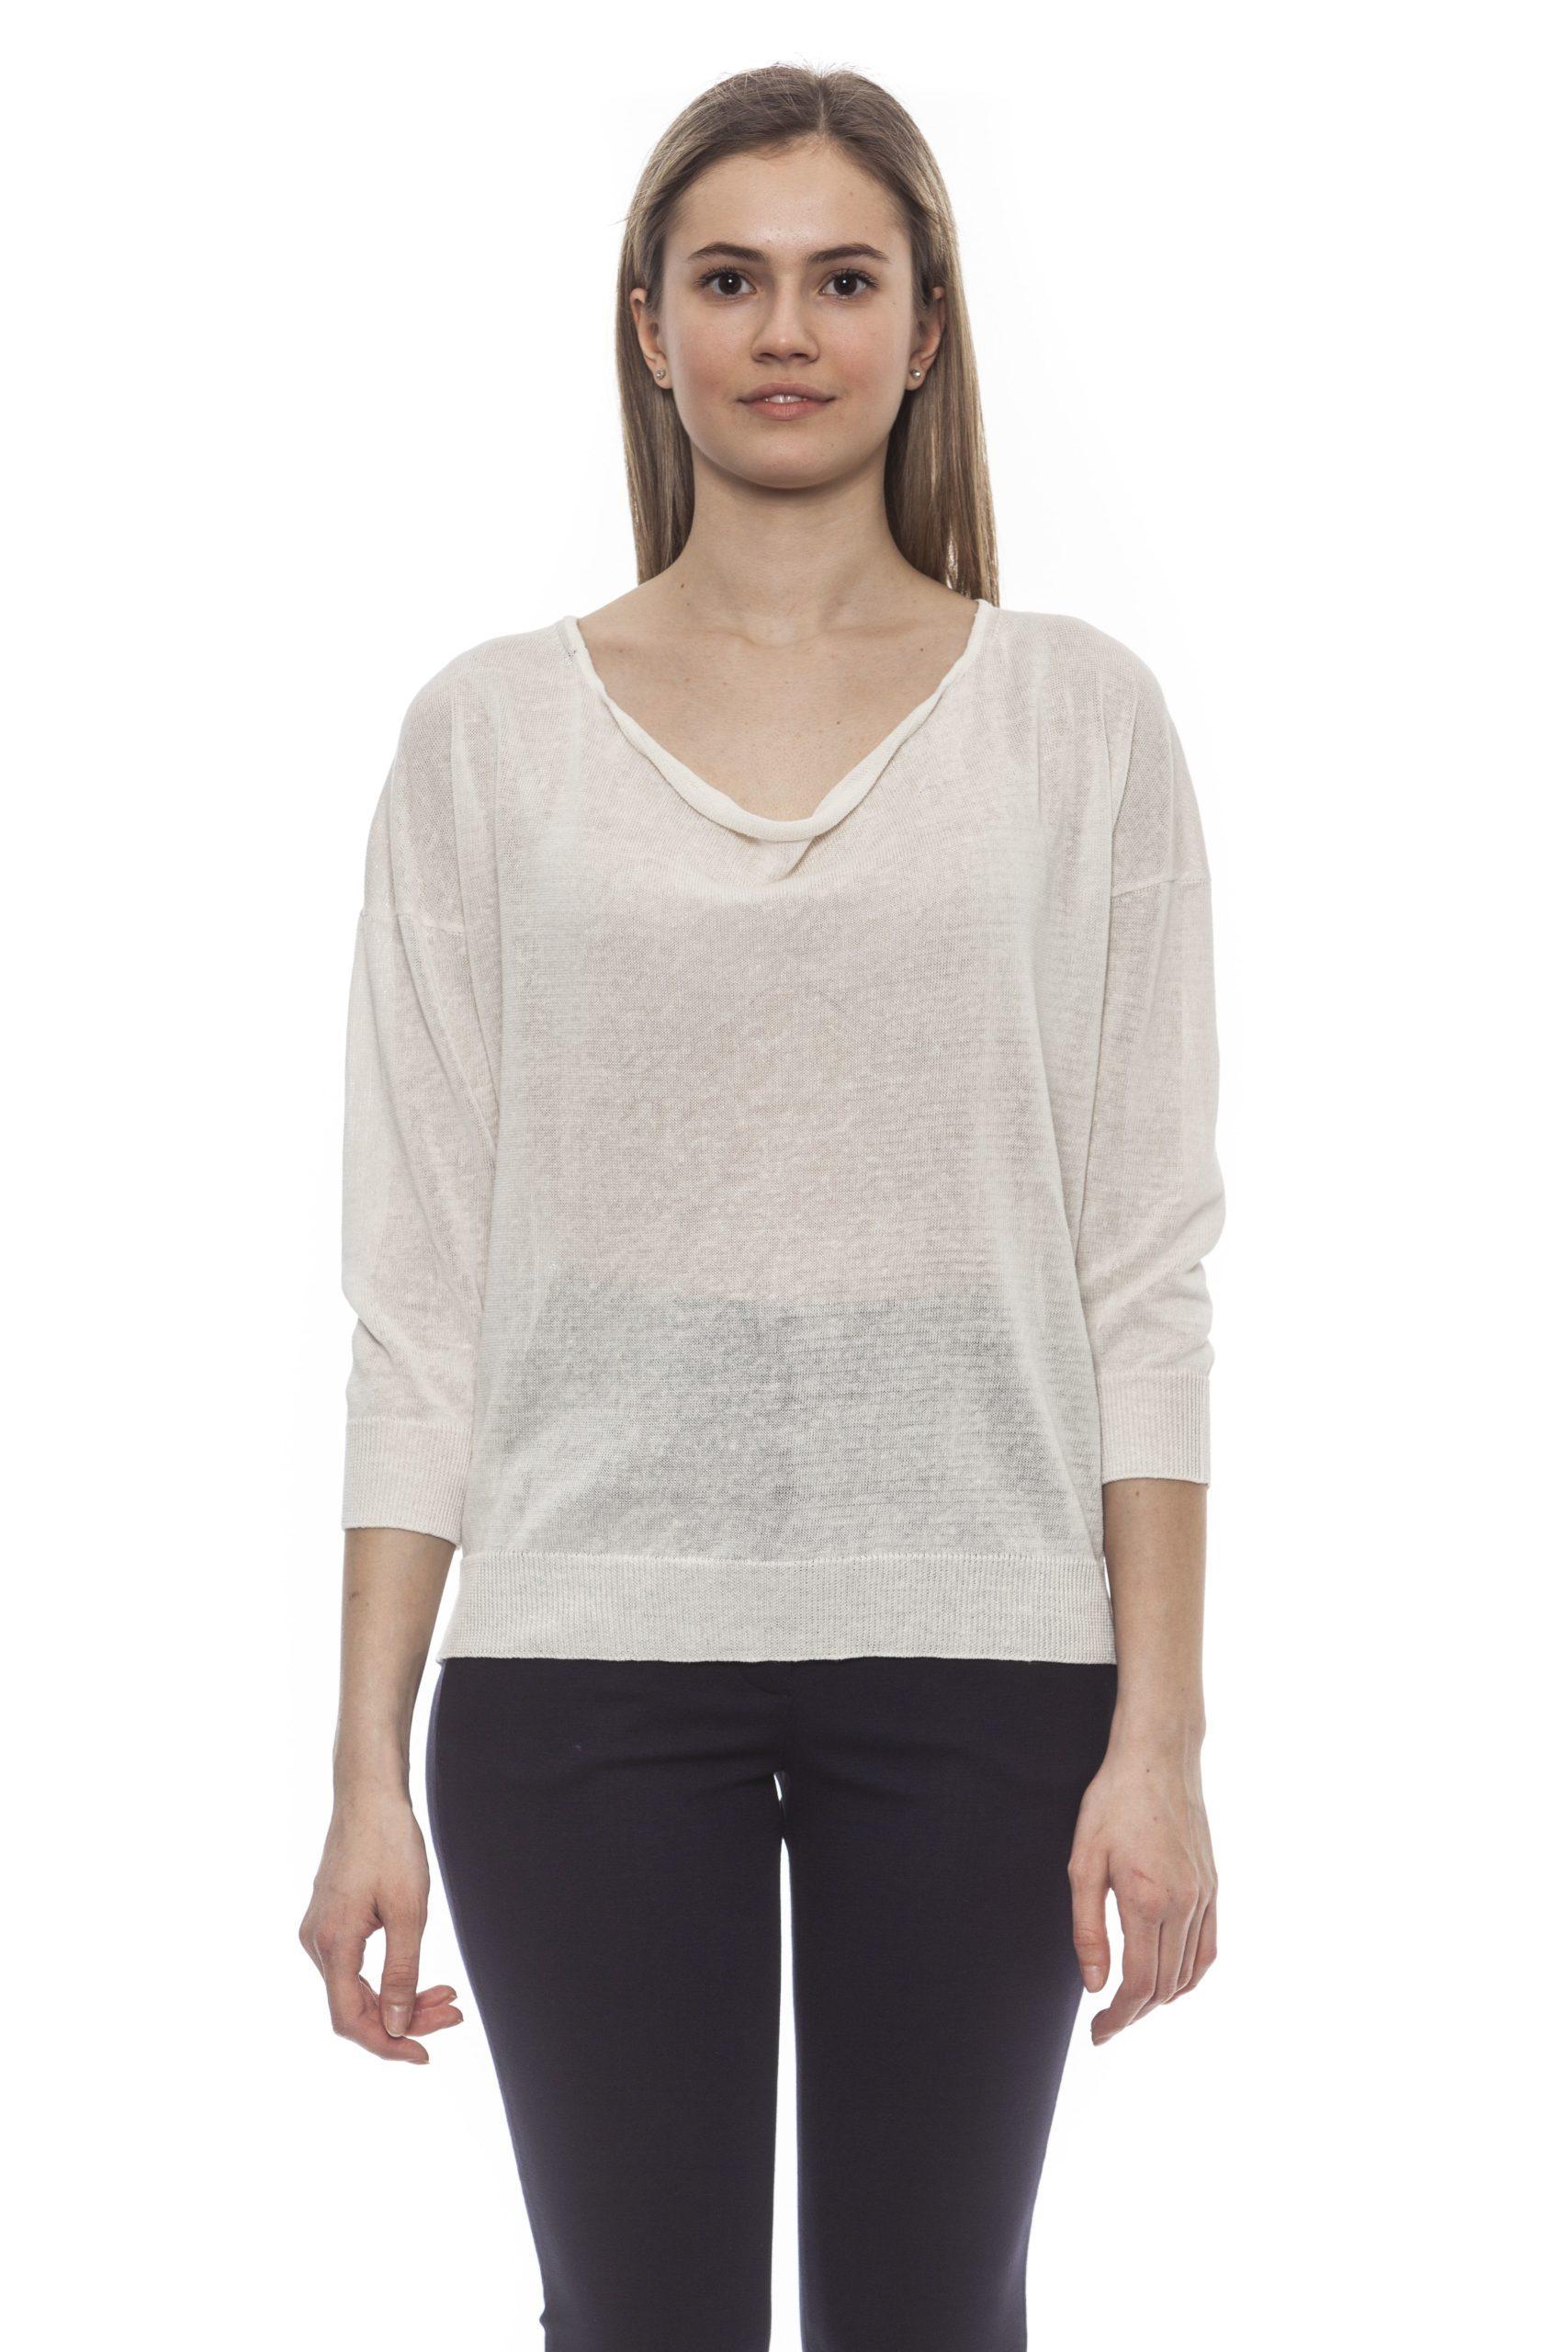 Peserico Women's Bianco Sweater White PE1383134 - IT42 | S